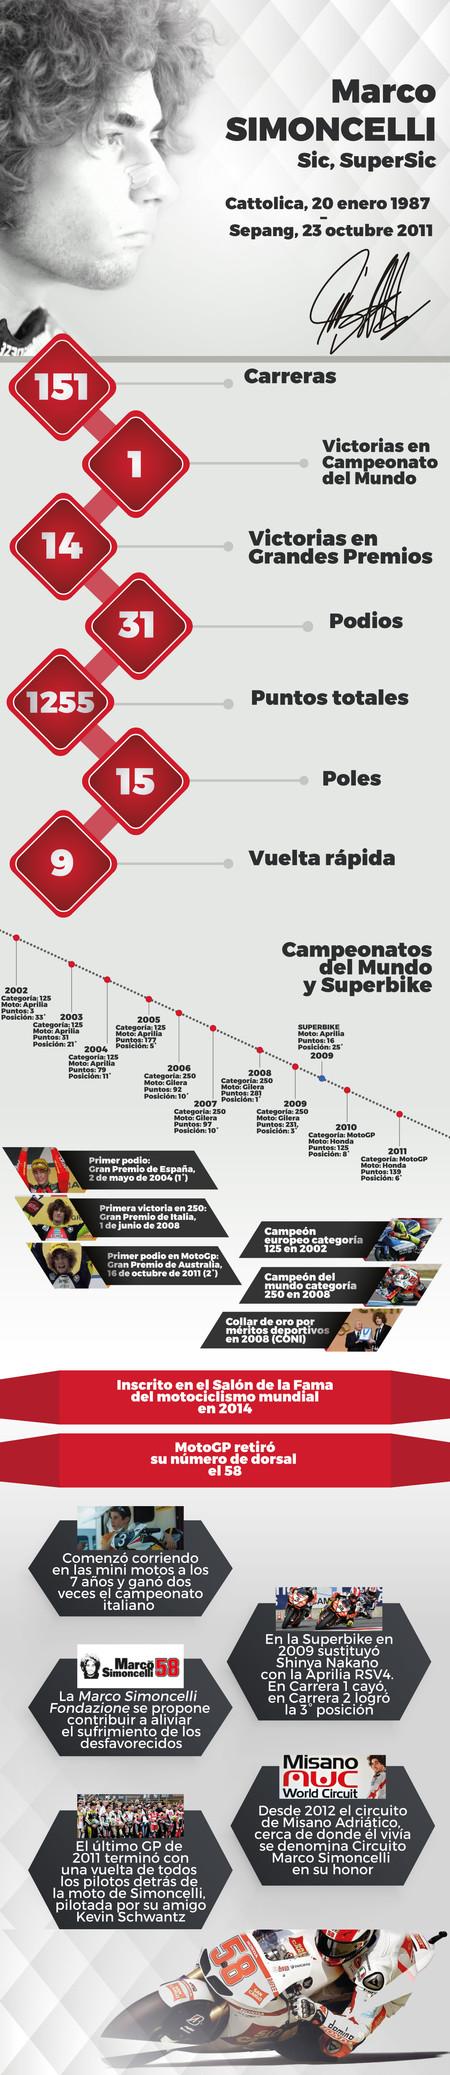 Simoncelli1